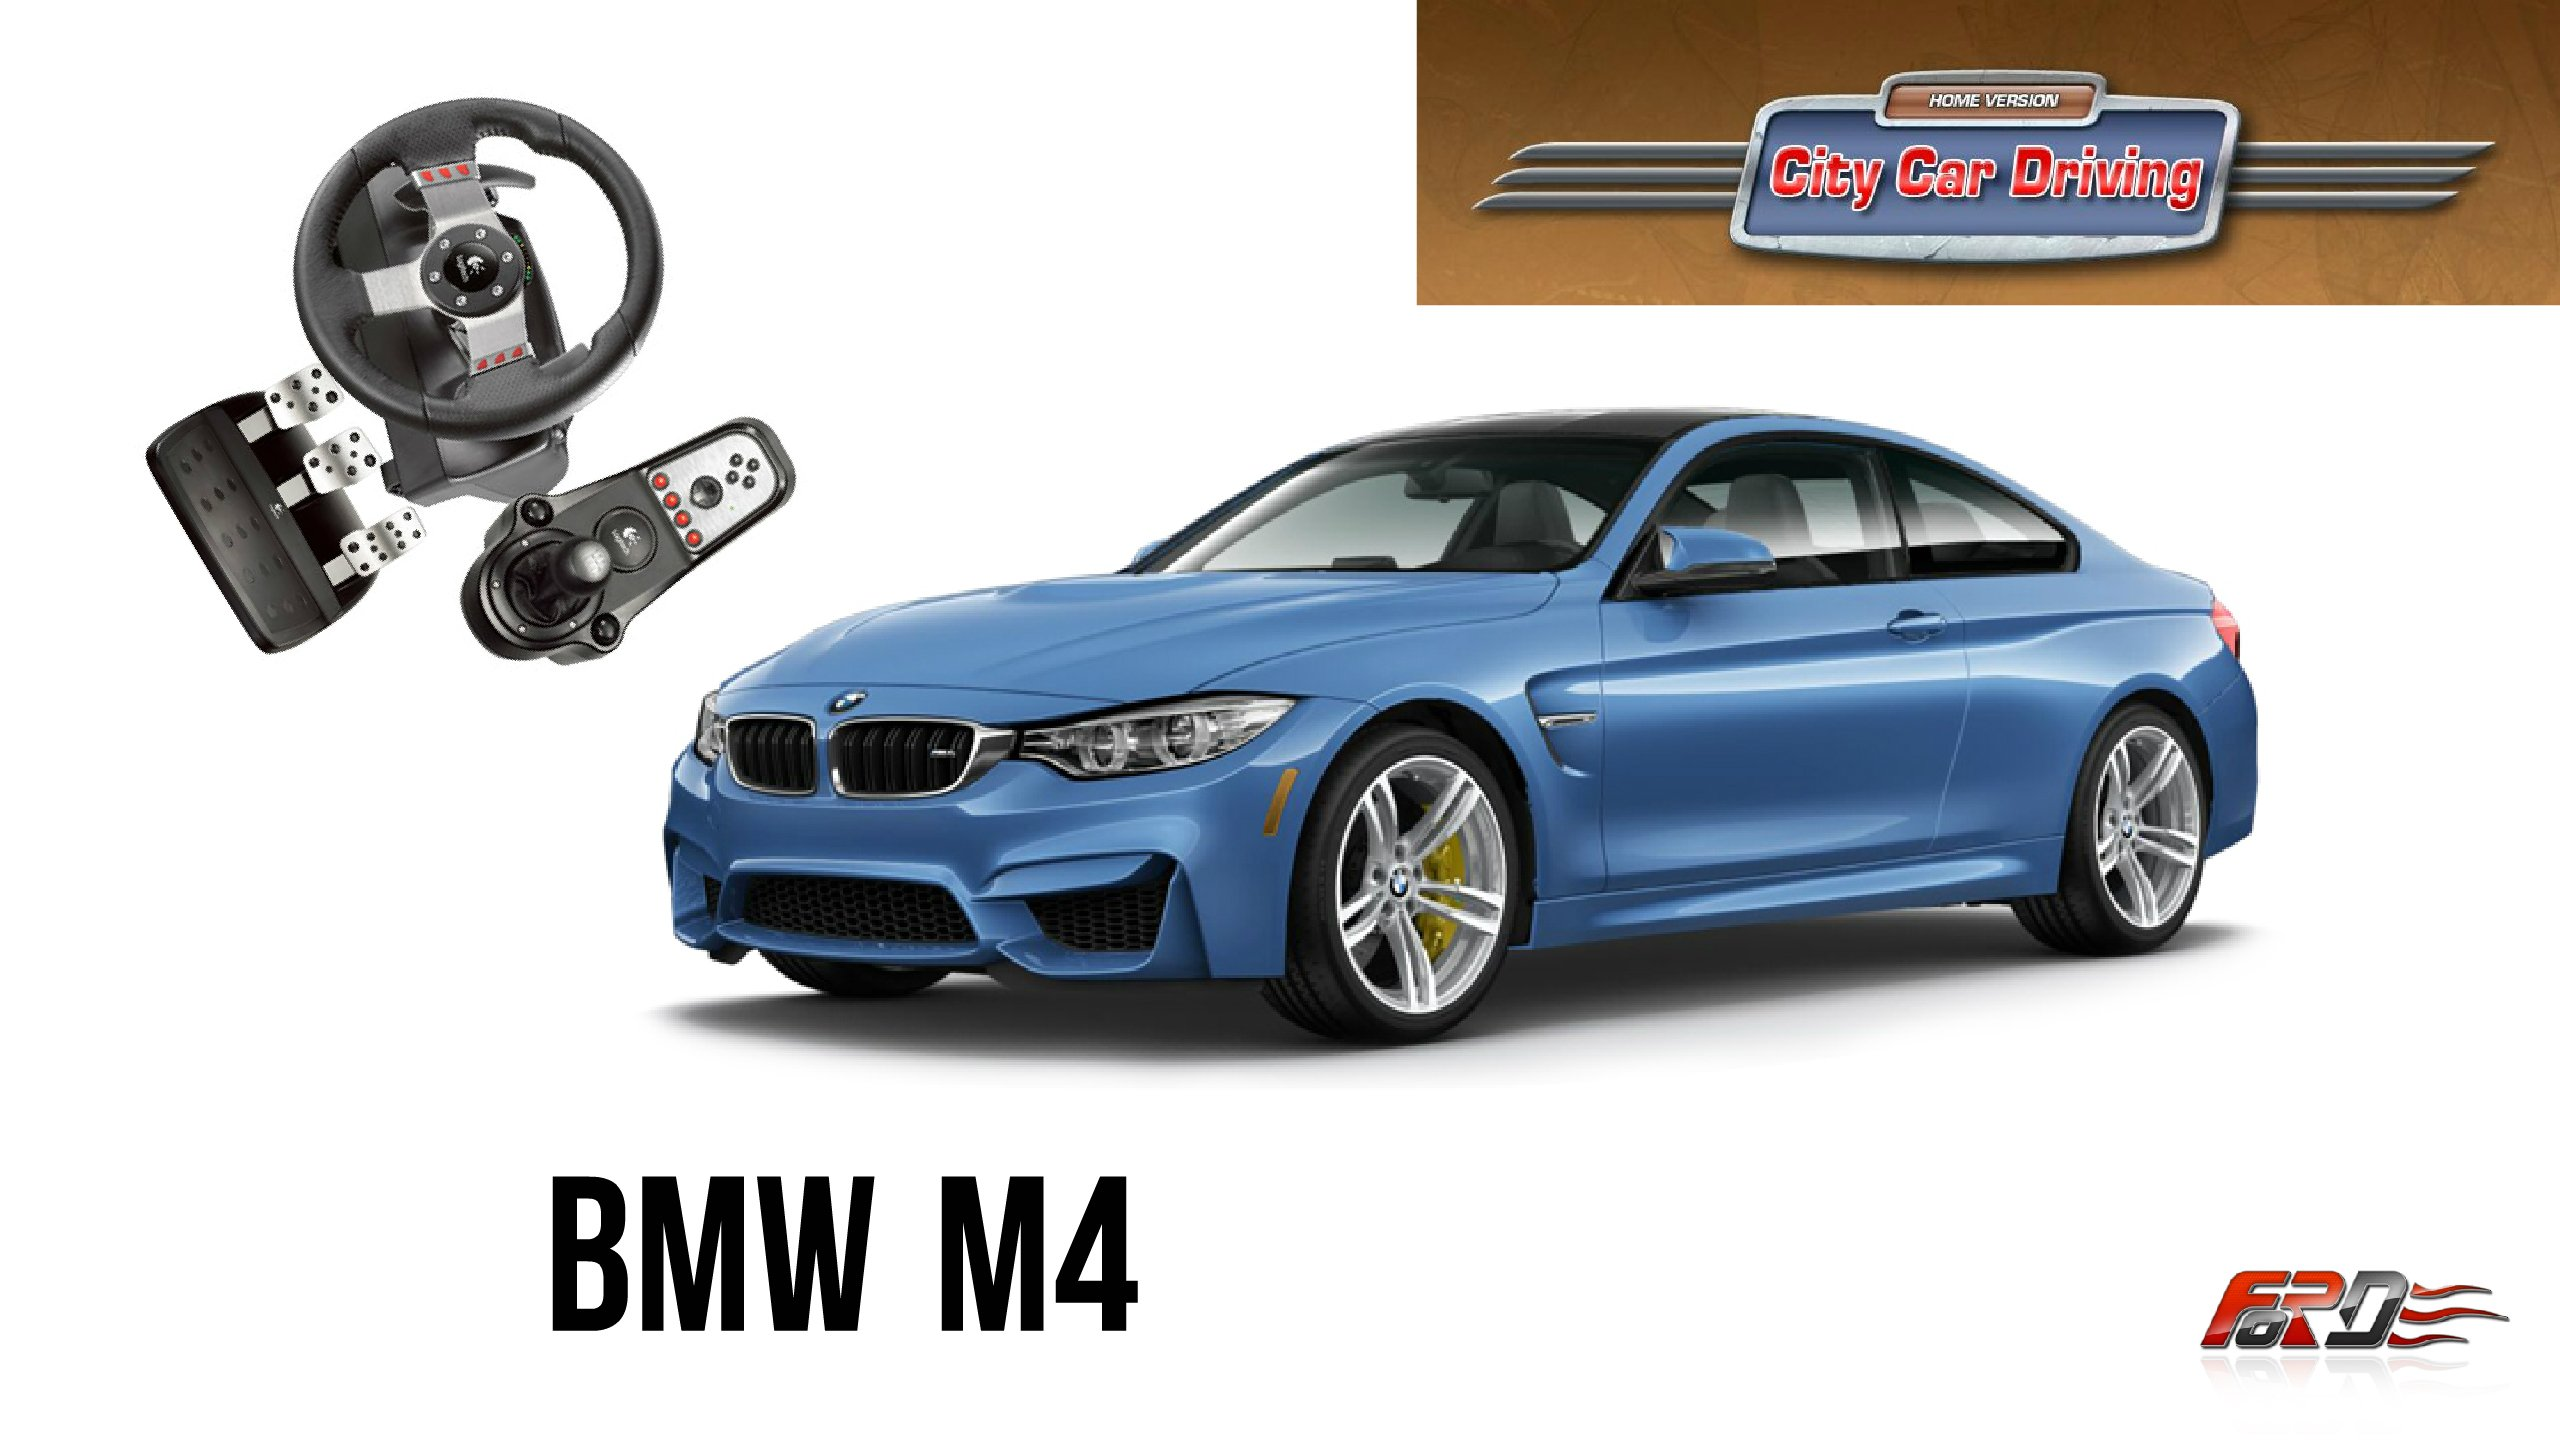 BMW M4 тест-драйв, обзор спортивного купе, шашки на автостраде в City Car Driving!  - Изображение 1